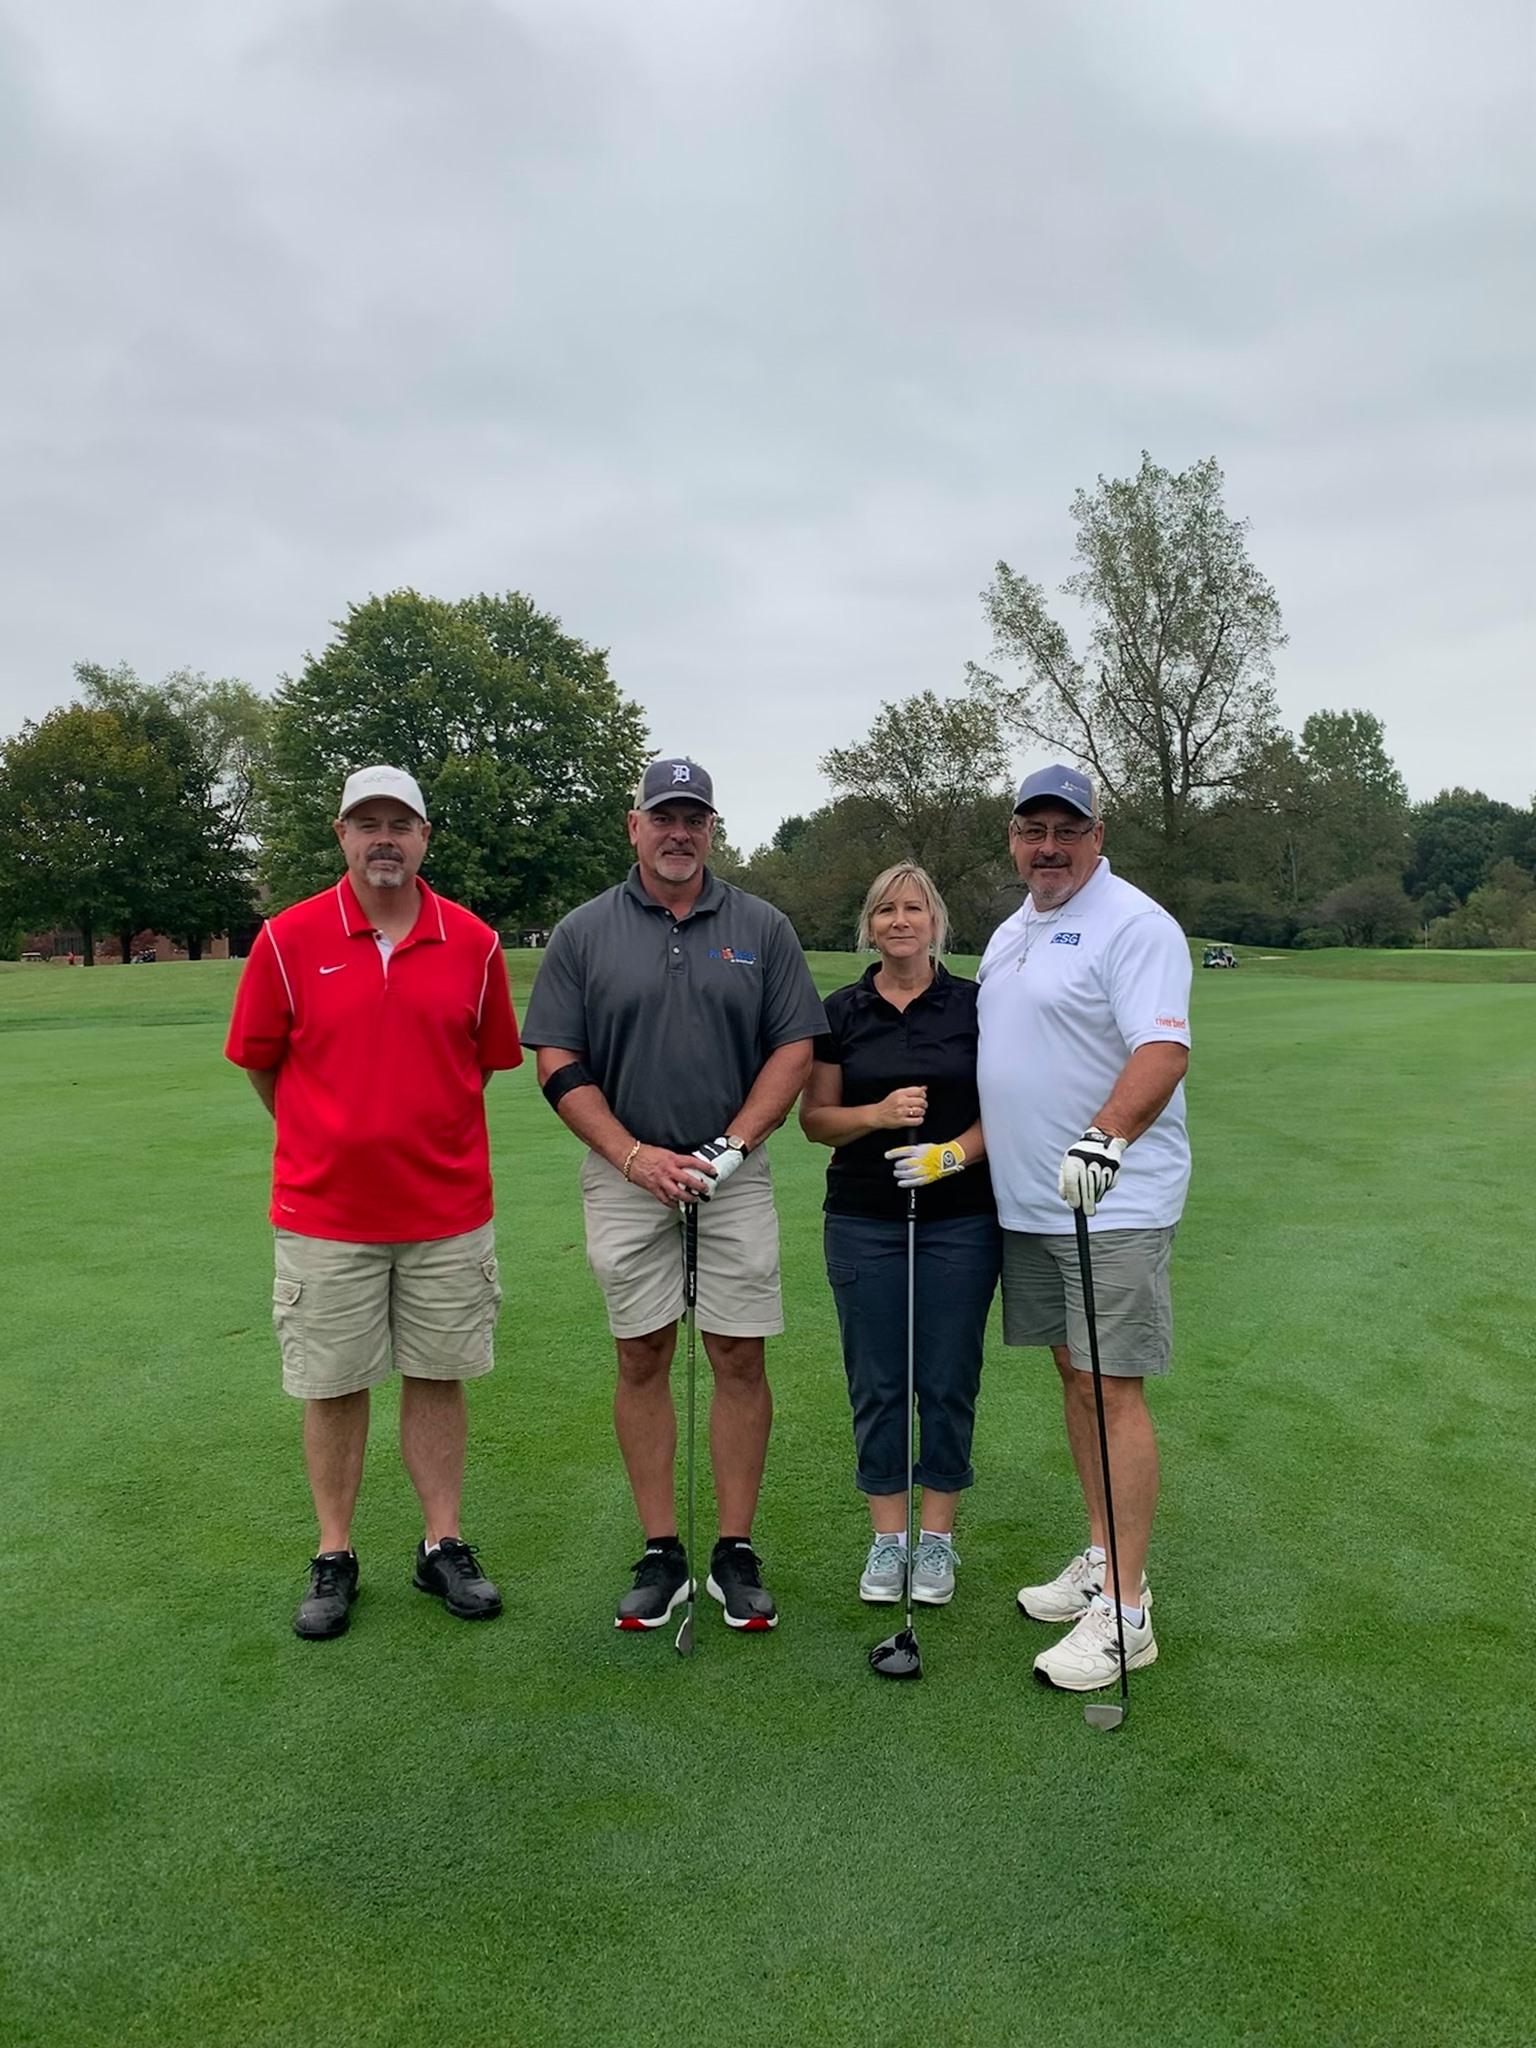 SACC-Golf-Outing-2021-Pet-Butler.jpg